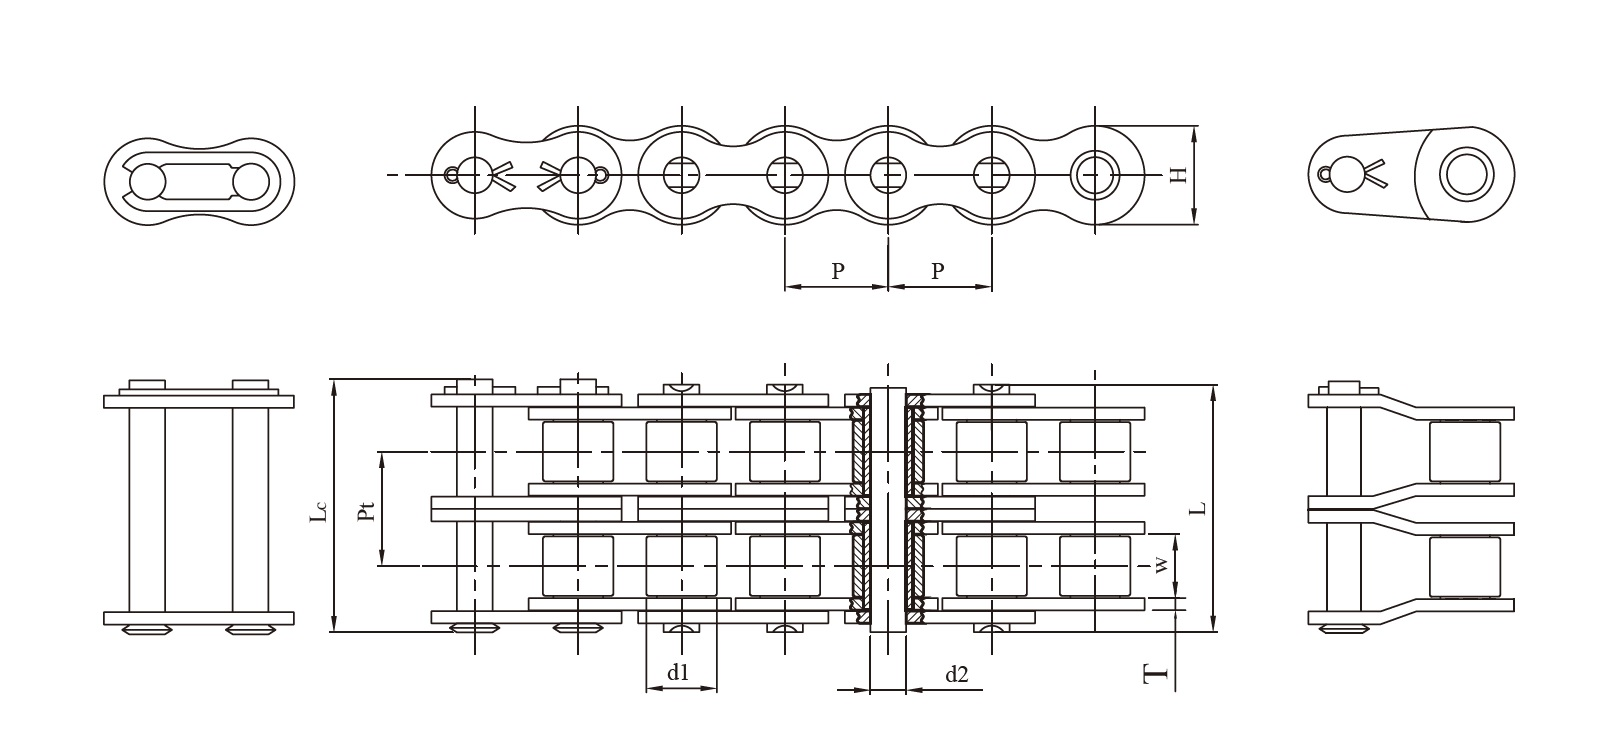 proimages/product/01chain/05escalator/escalator-02.jpg